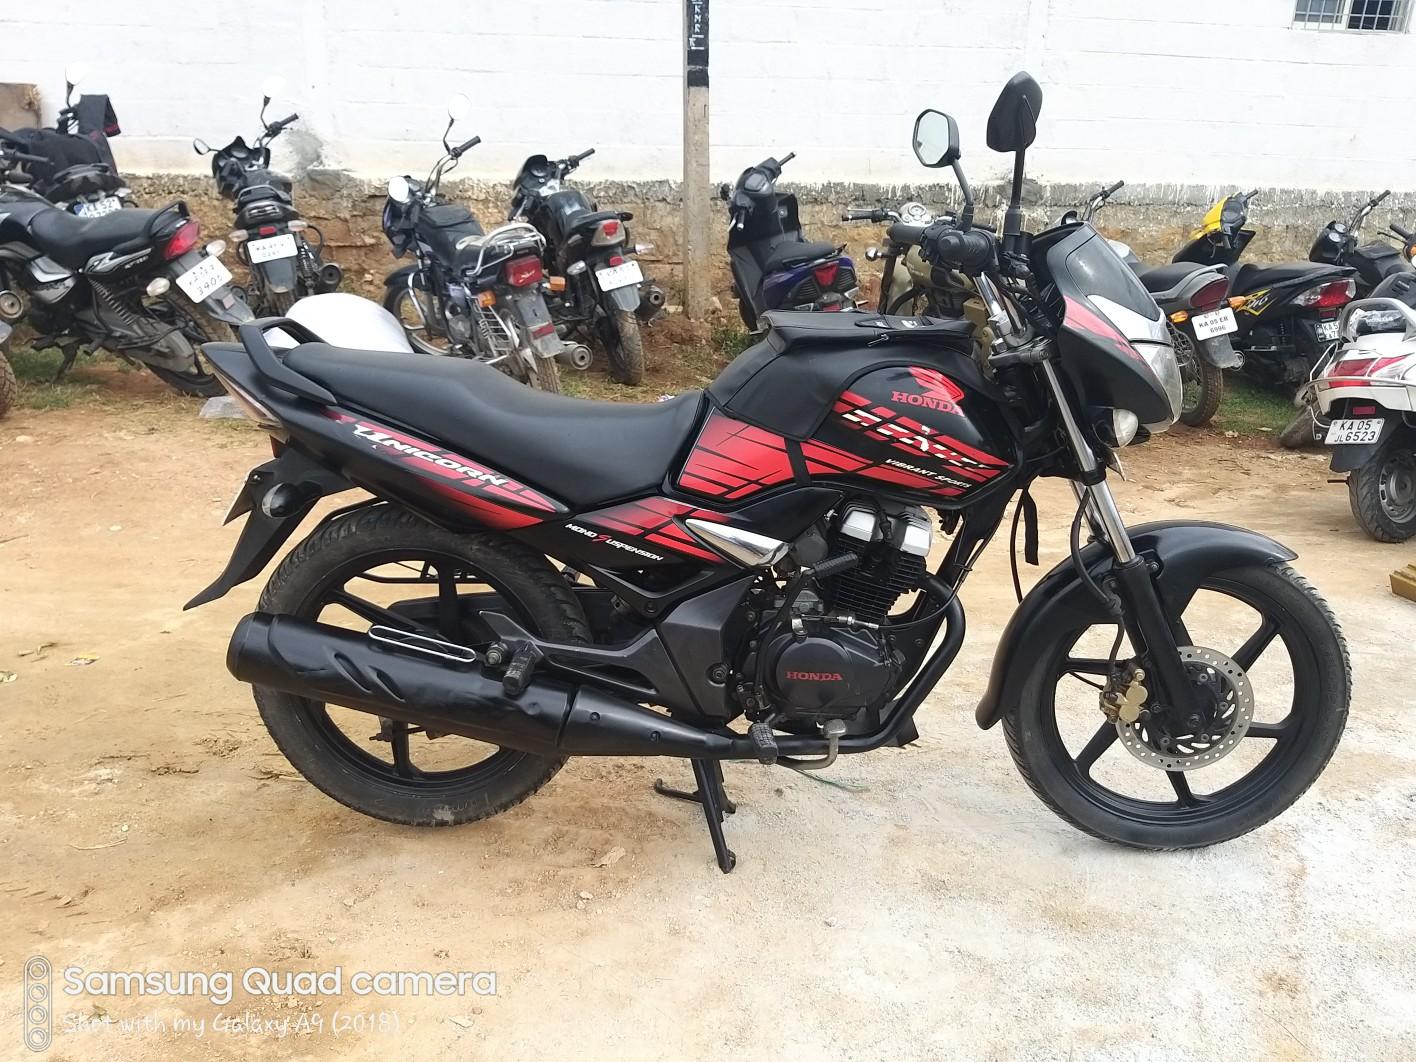 Honda CB Unicorn 150 Price, Mileage, Review, Specs